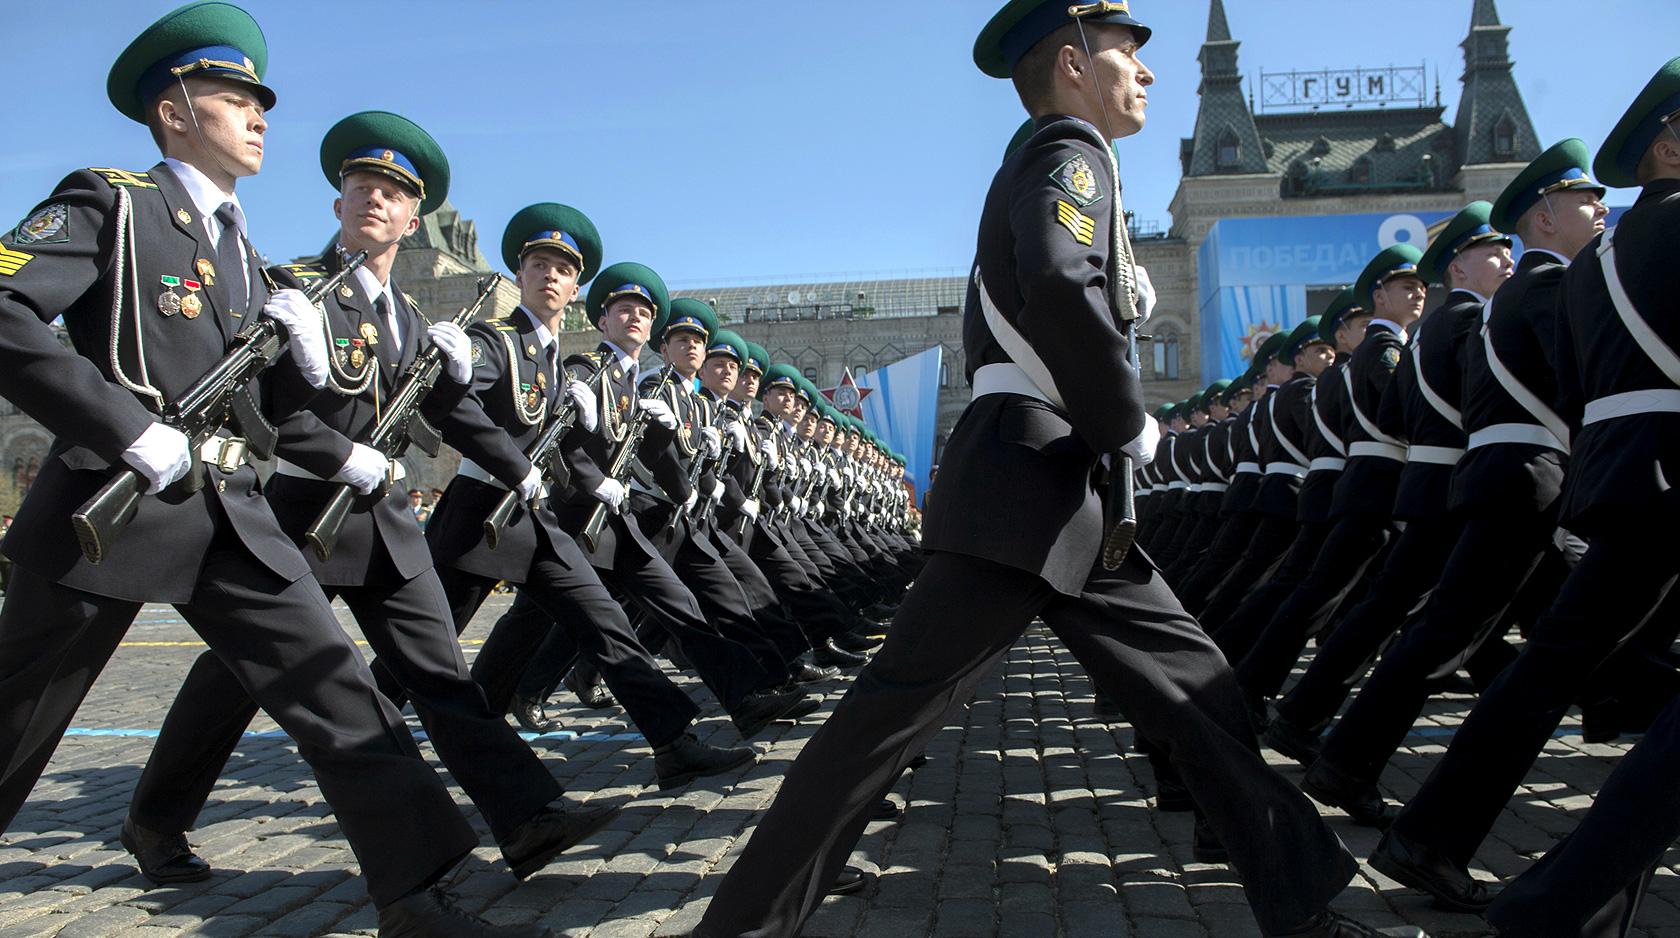 kriptograf-kursanti-moskvi-porno-flaga